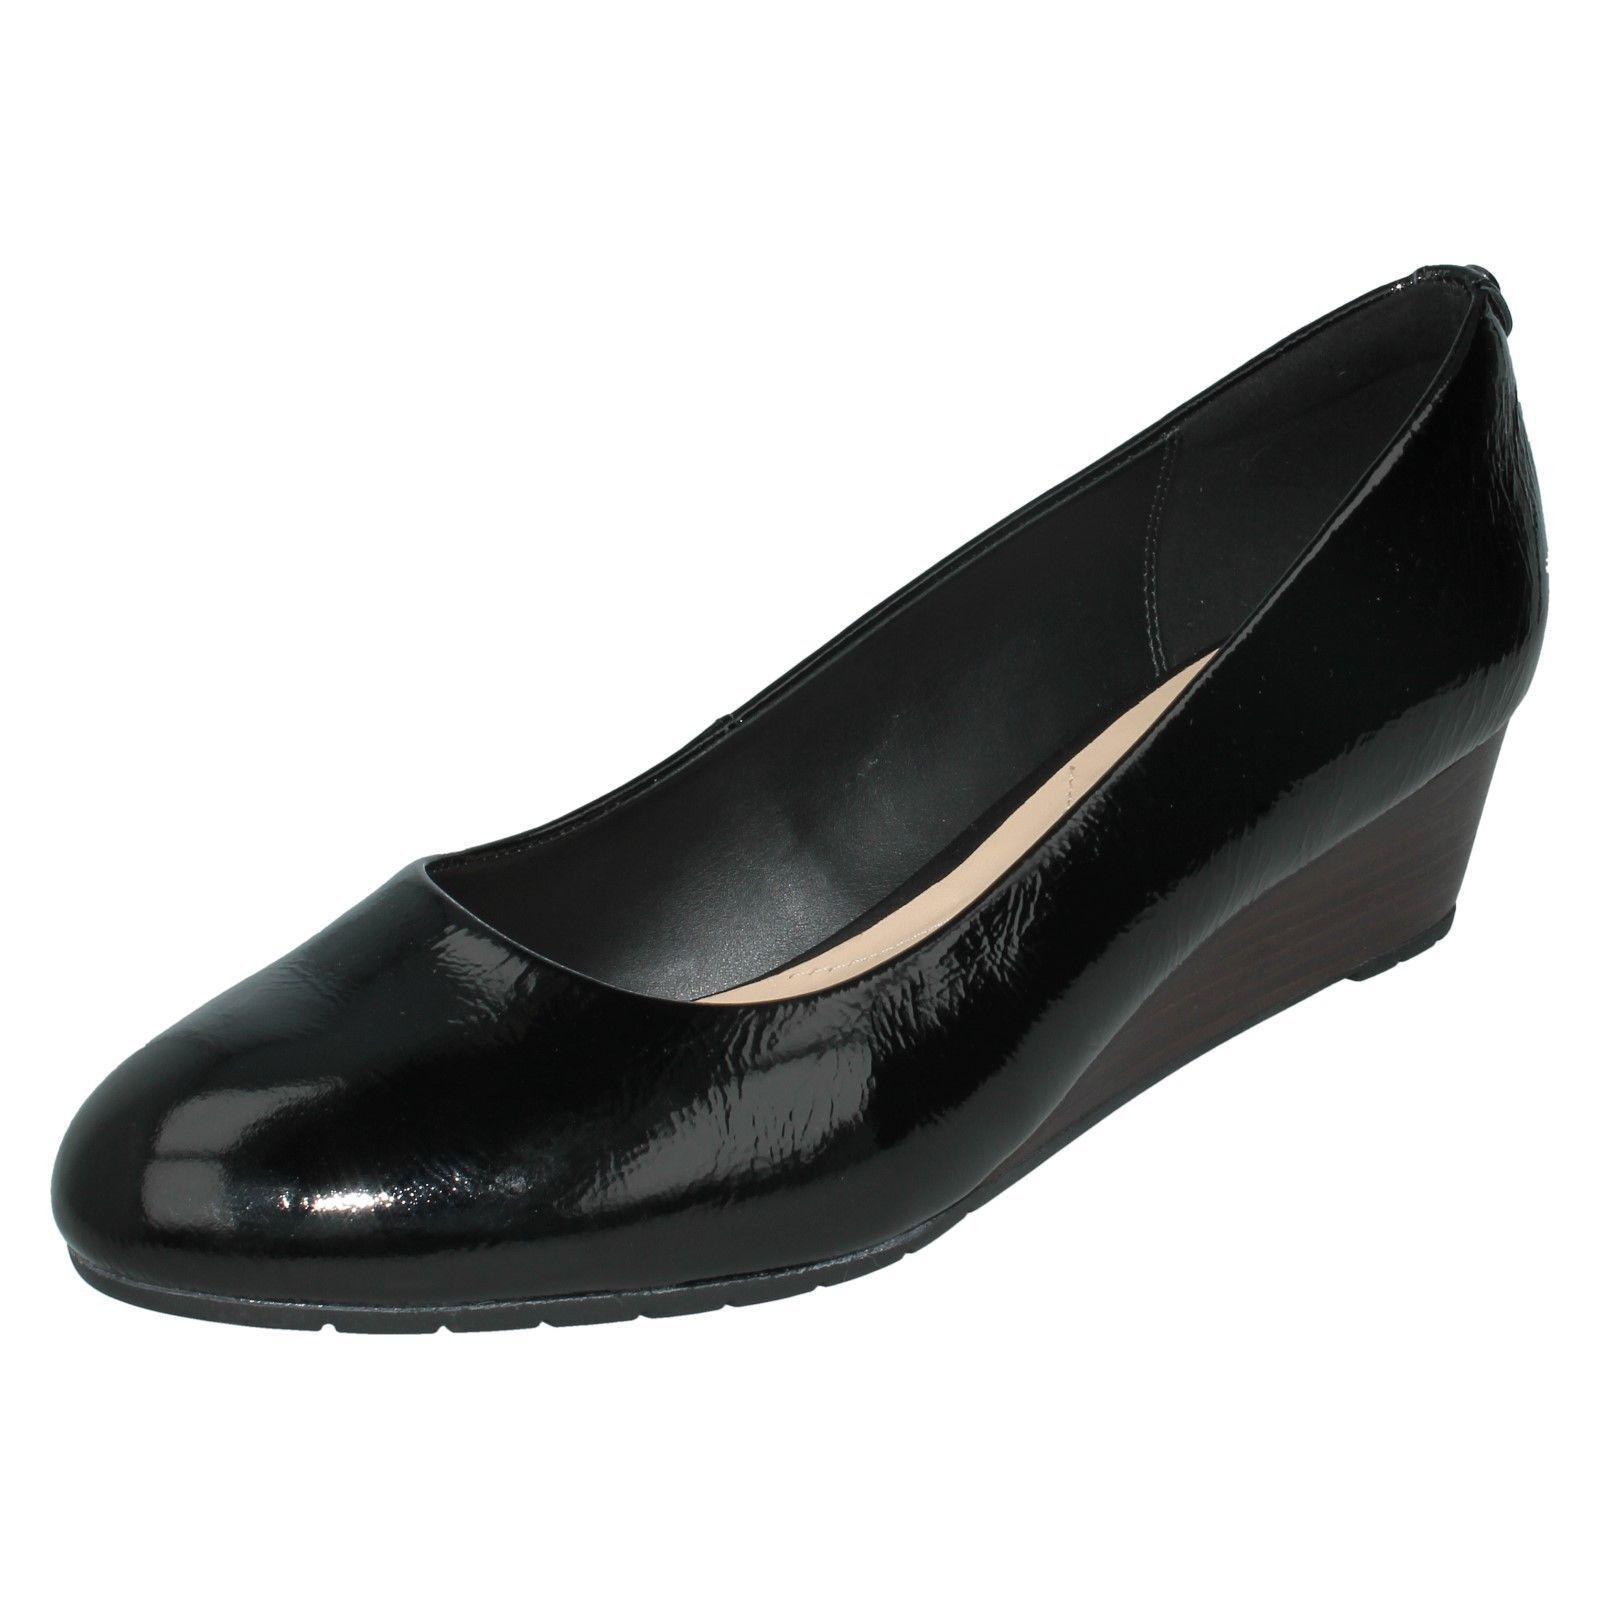 Damen Bügel Schwarzes Lackleder Clarks ohne Bügel Damen Keilabsatz Schuhe Vendra Bloom d426bb